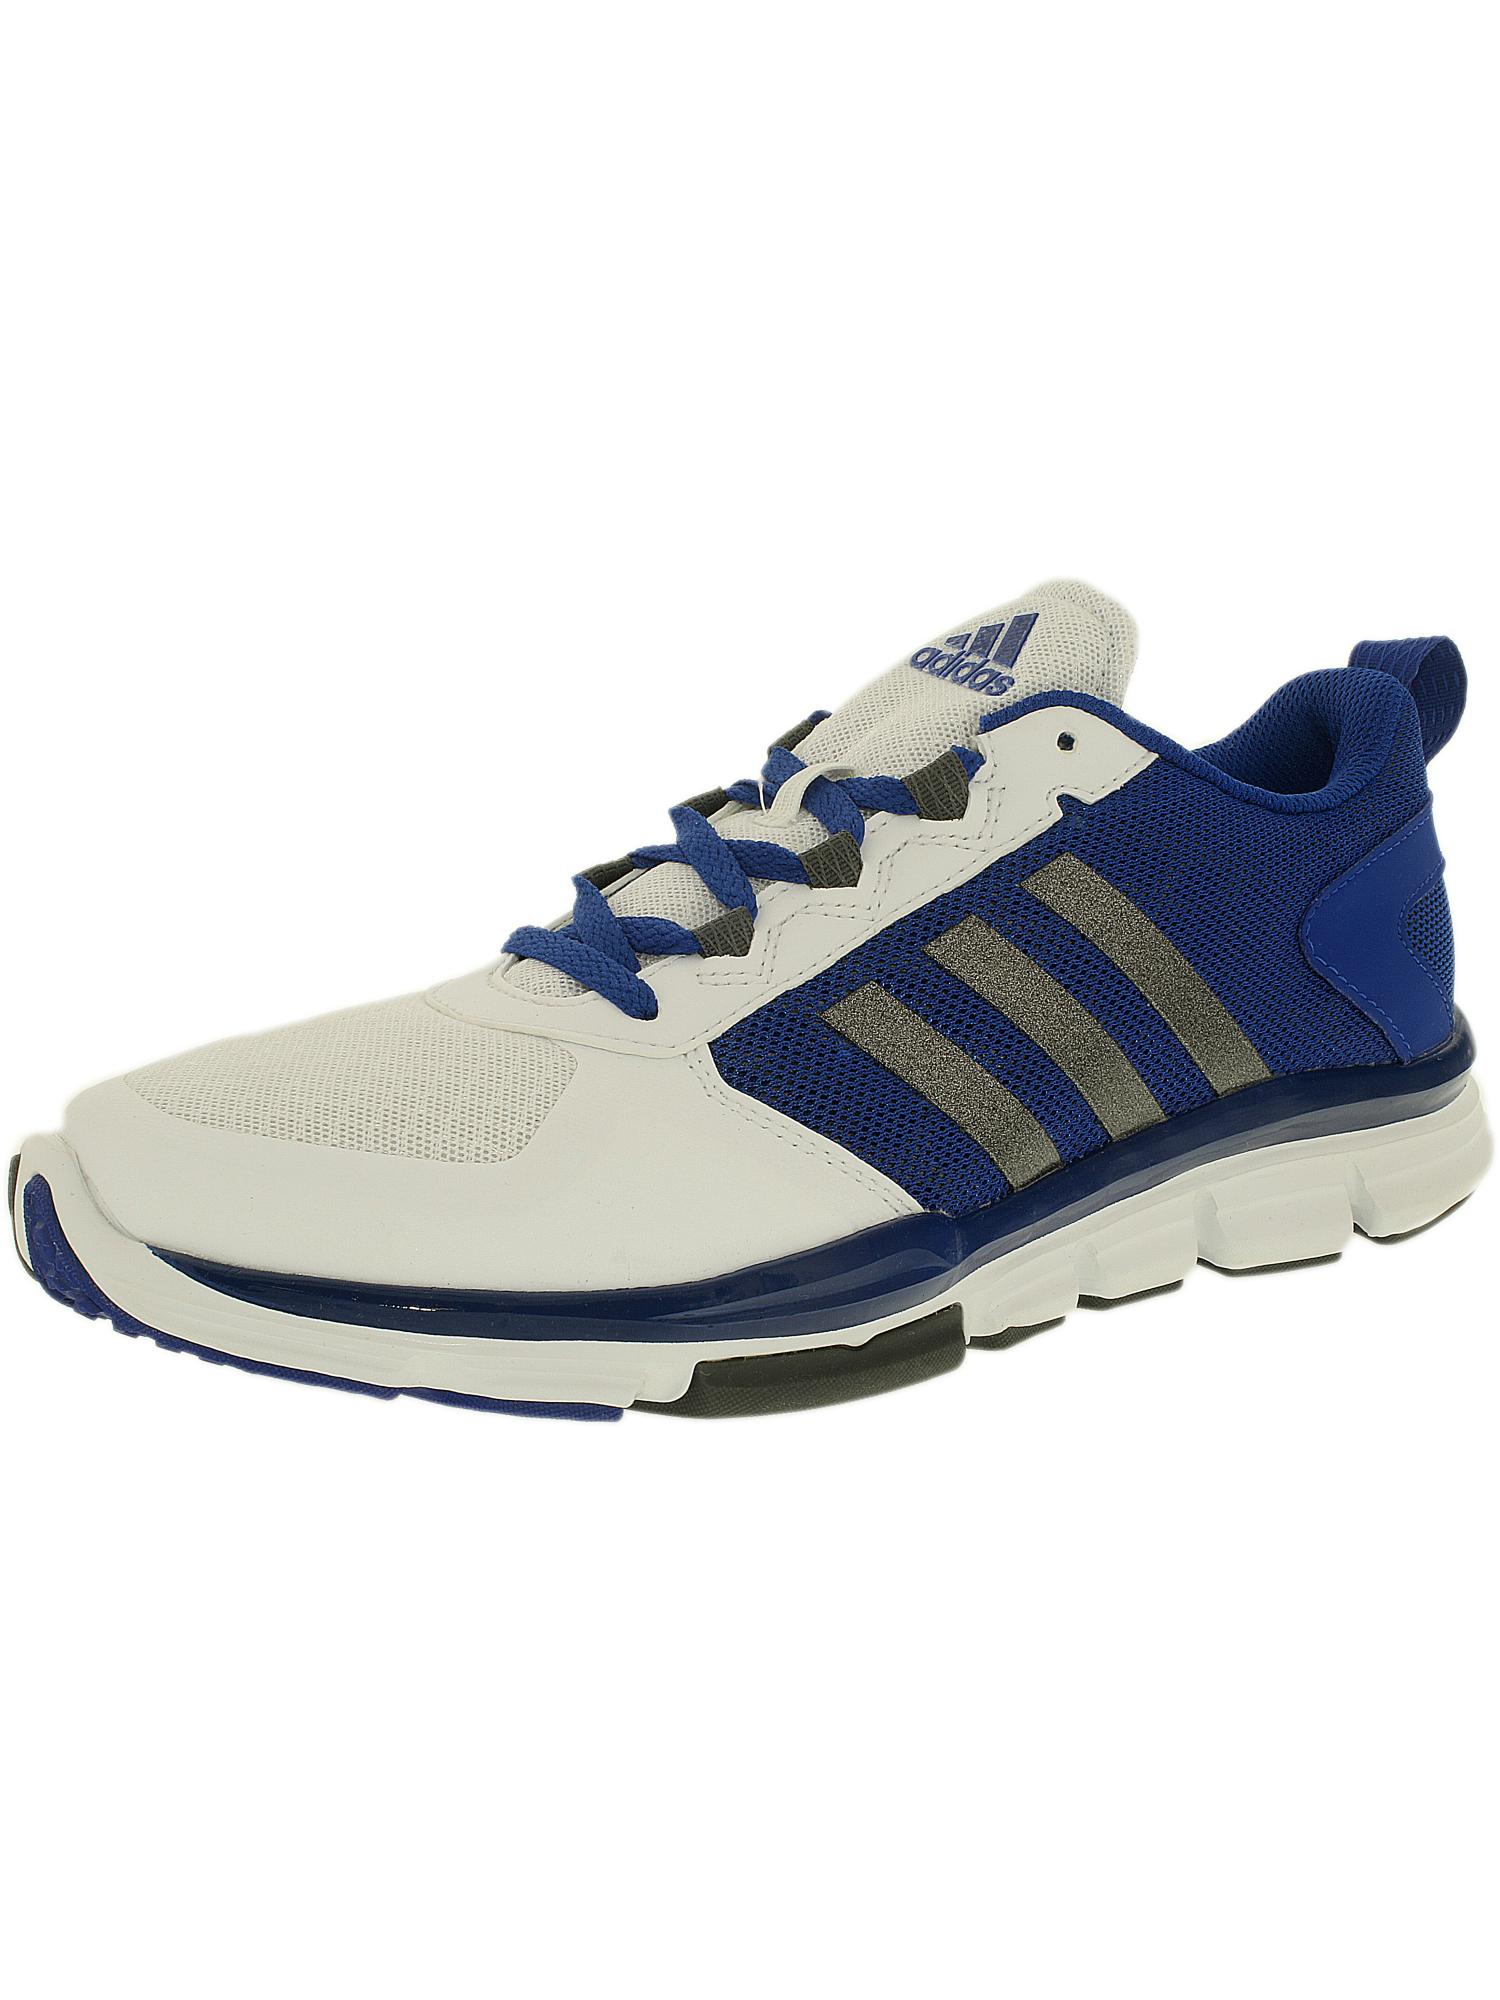 Adidas männer niedrig schnell trainer 2 niedrig männer top - schuh 080f23